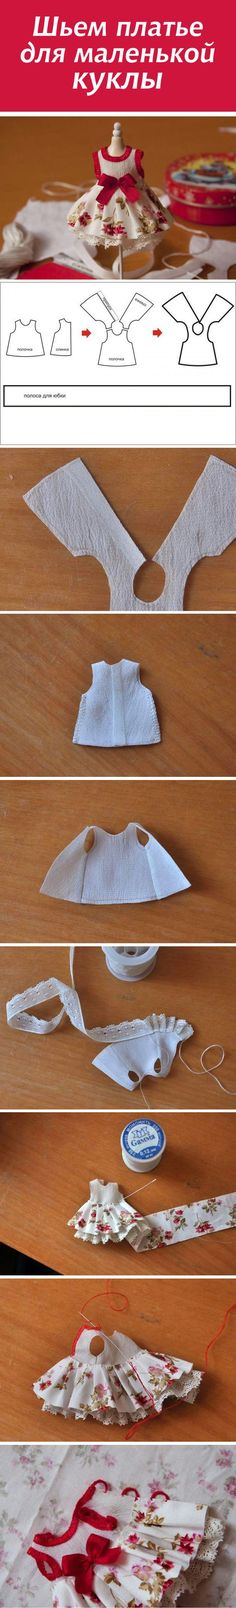 Шьем платье для маленькой куклы / Doll Outfit Tutorial #diy #tutorial #howto #doll #dolloutfit: